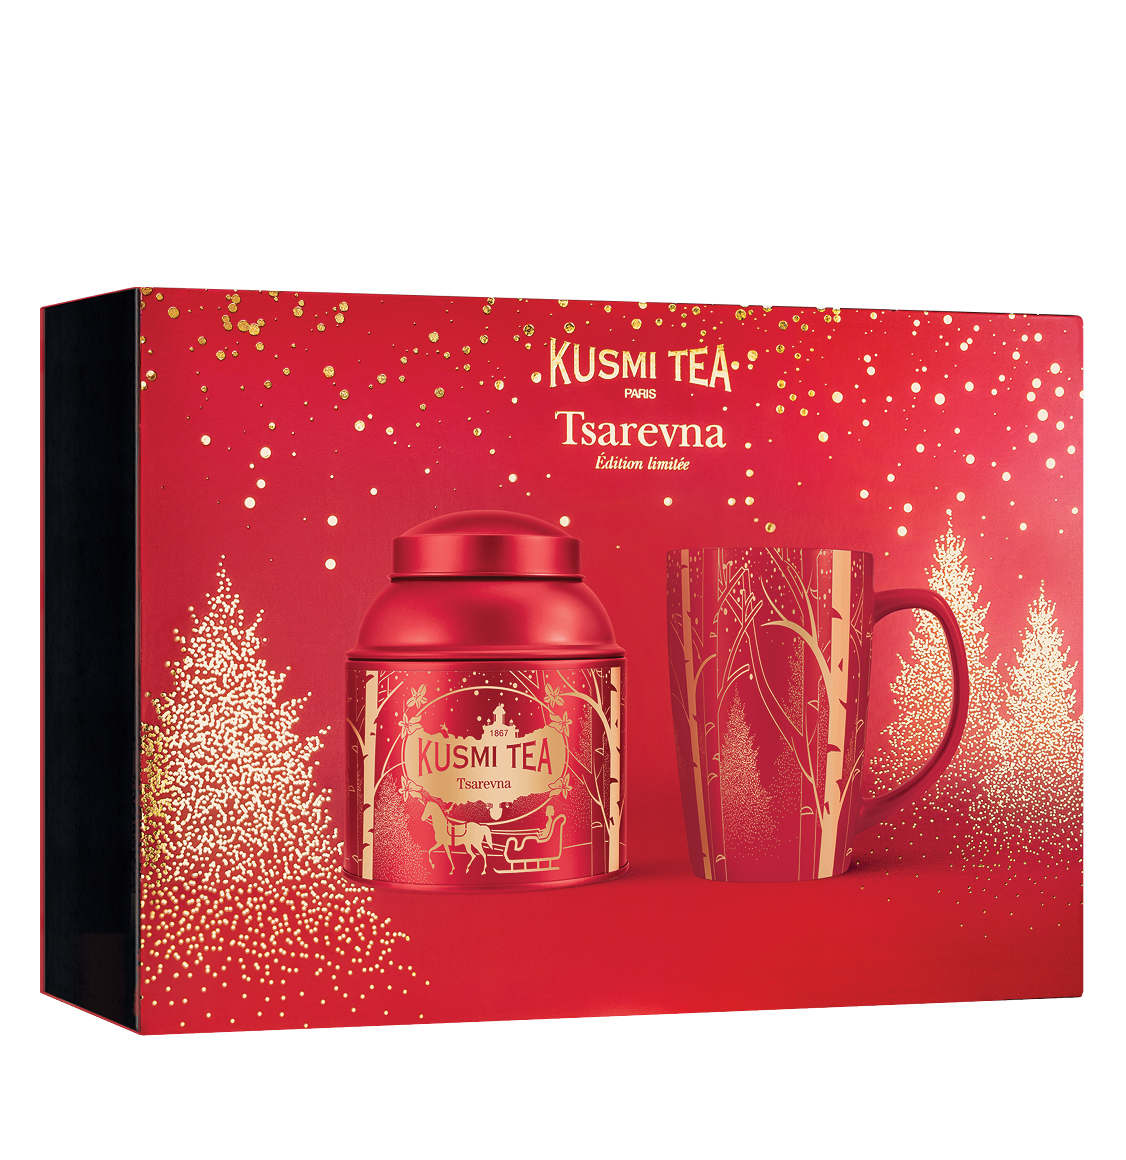 Kusmi Tsarevna Limited Edition Gift Set